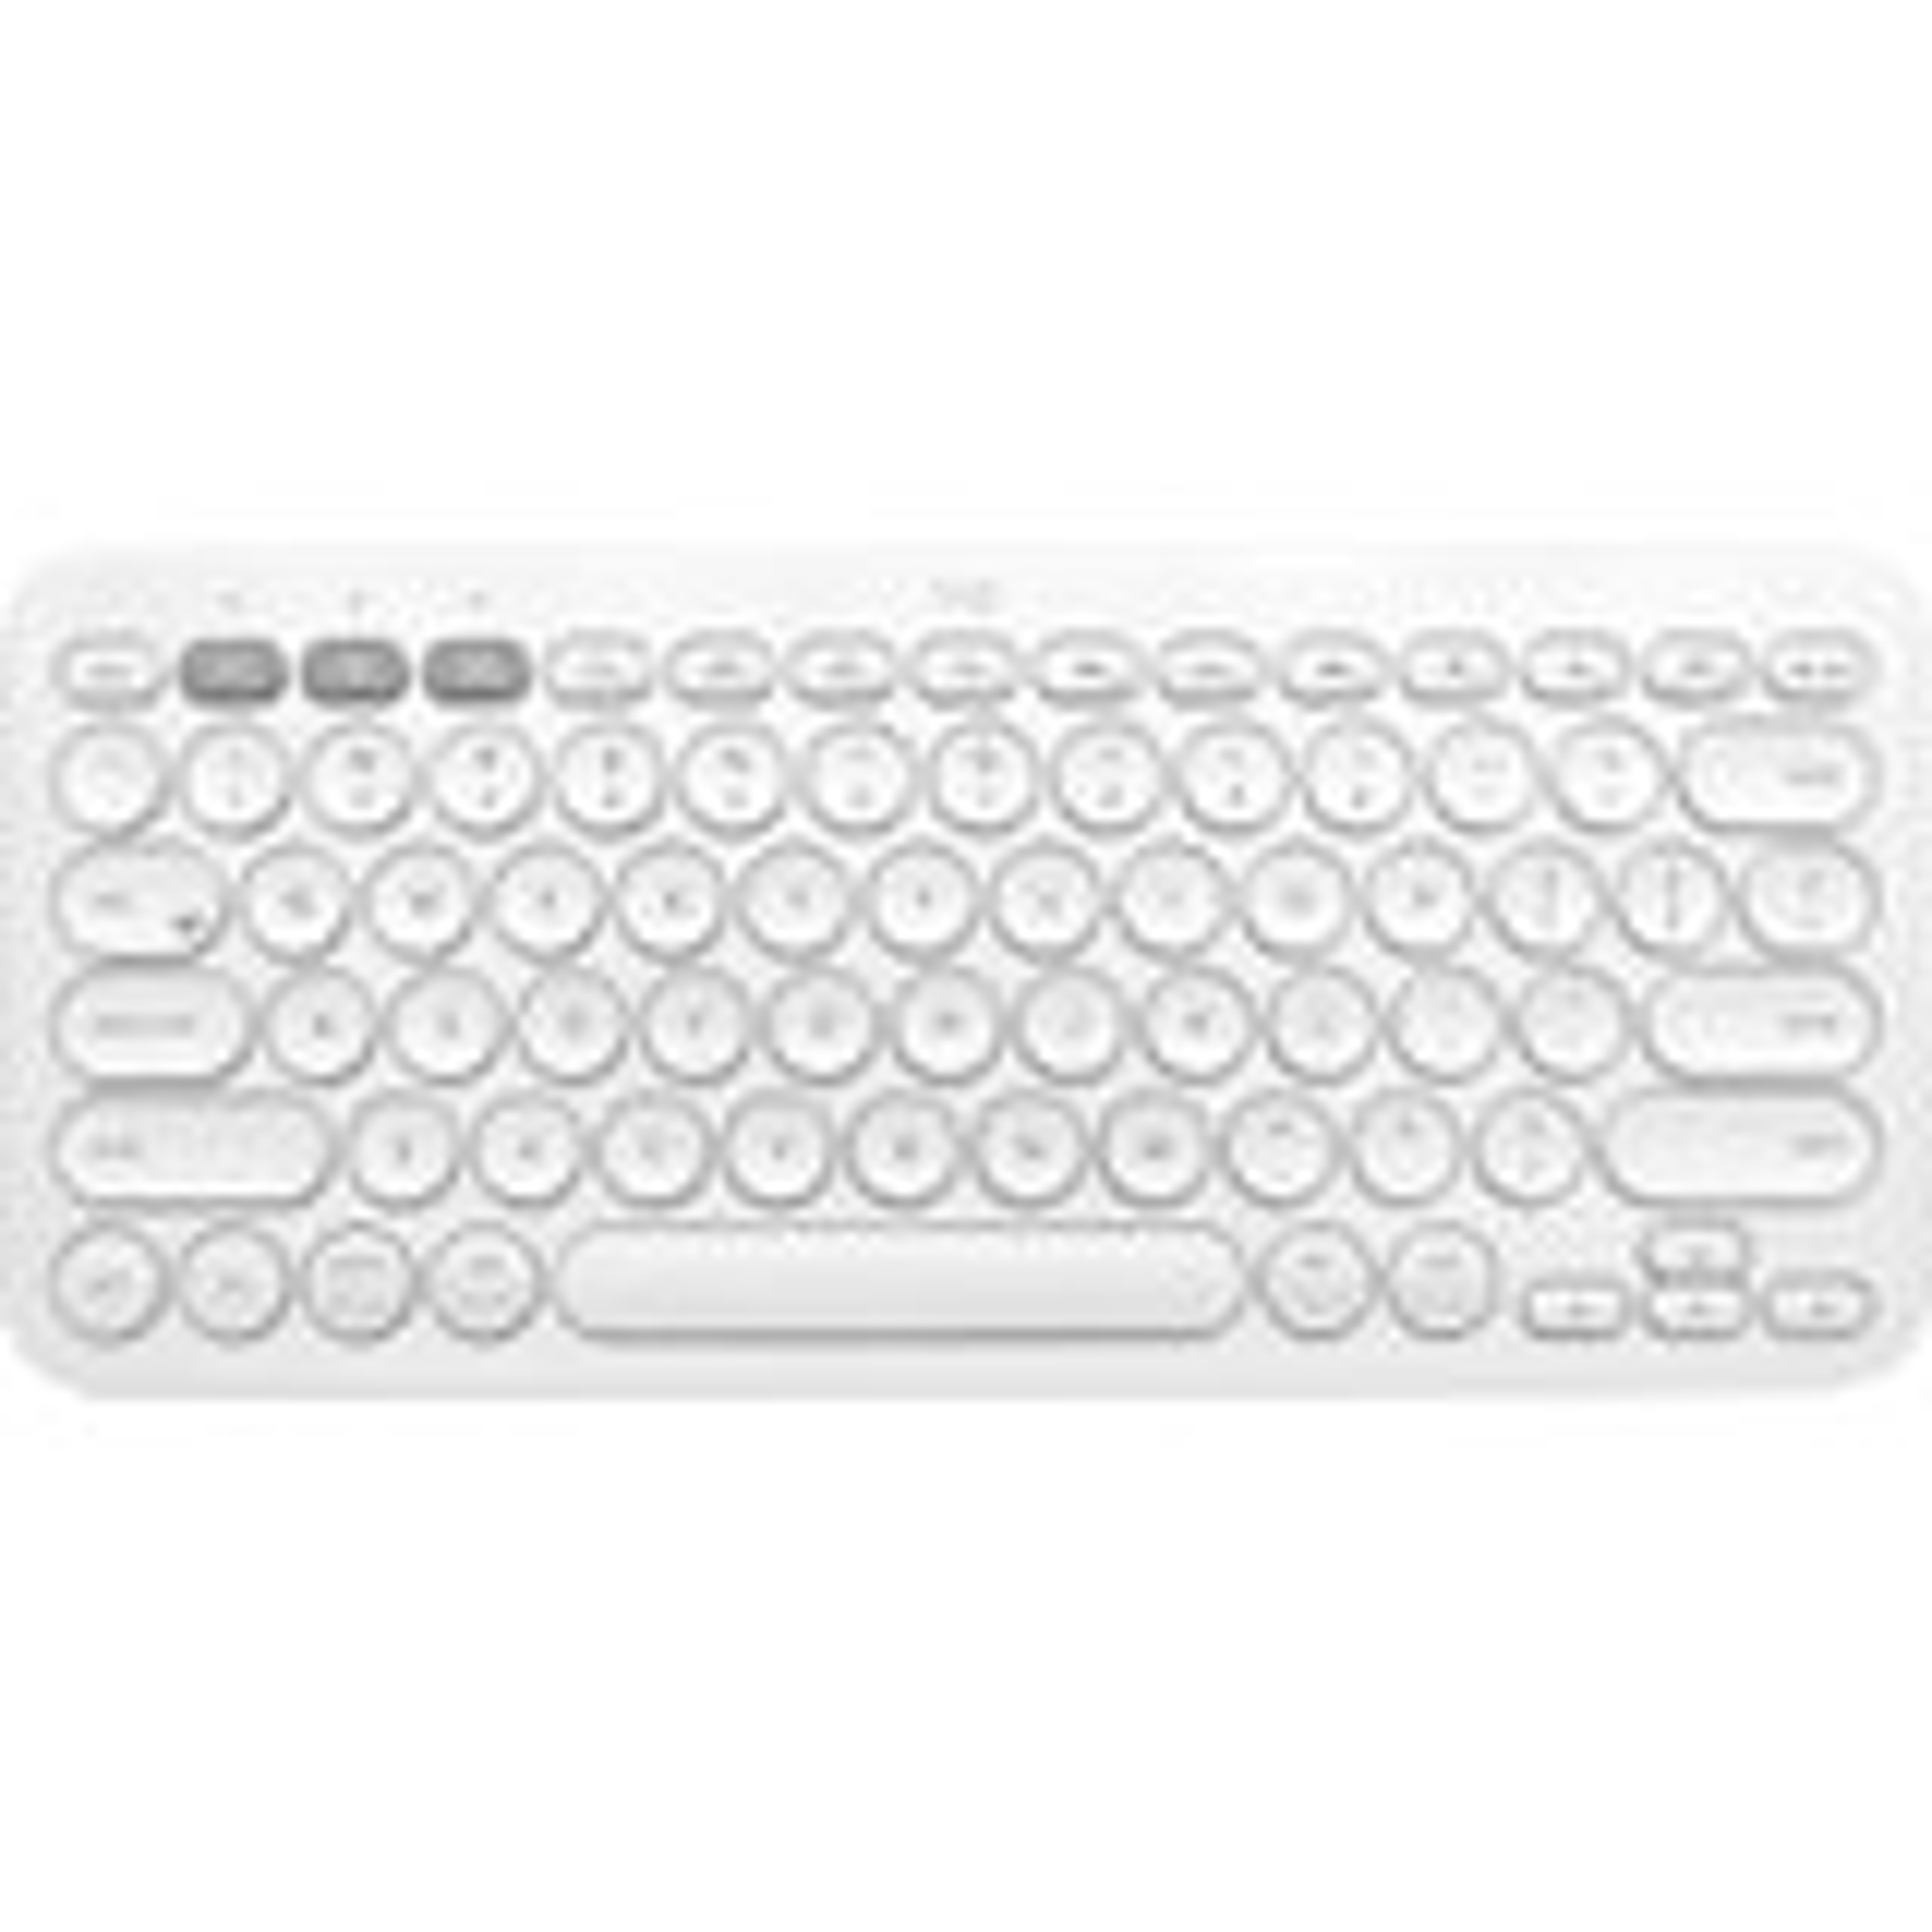 Logitech K380 for Mac Multi-Device Bluetooth Keyboard - OFFWHITE - UK - INTNL